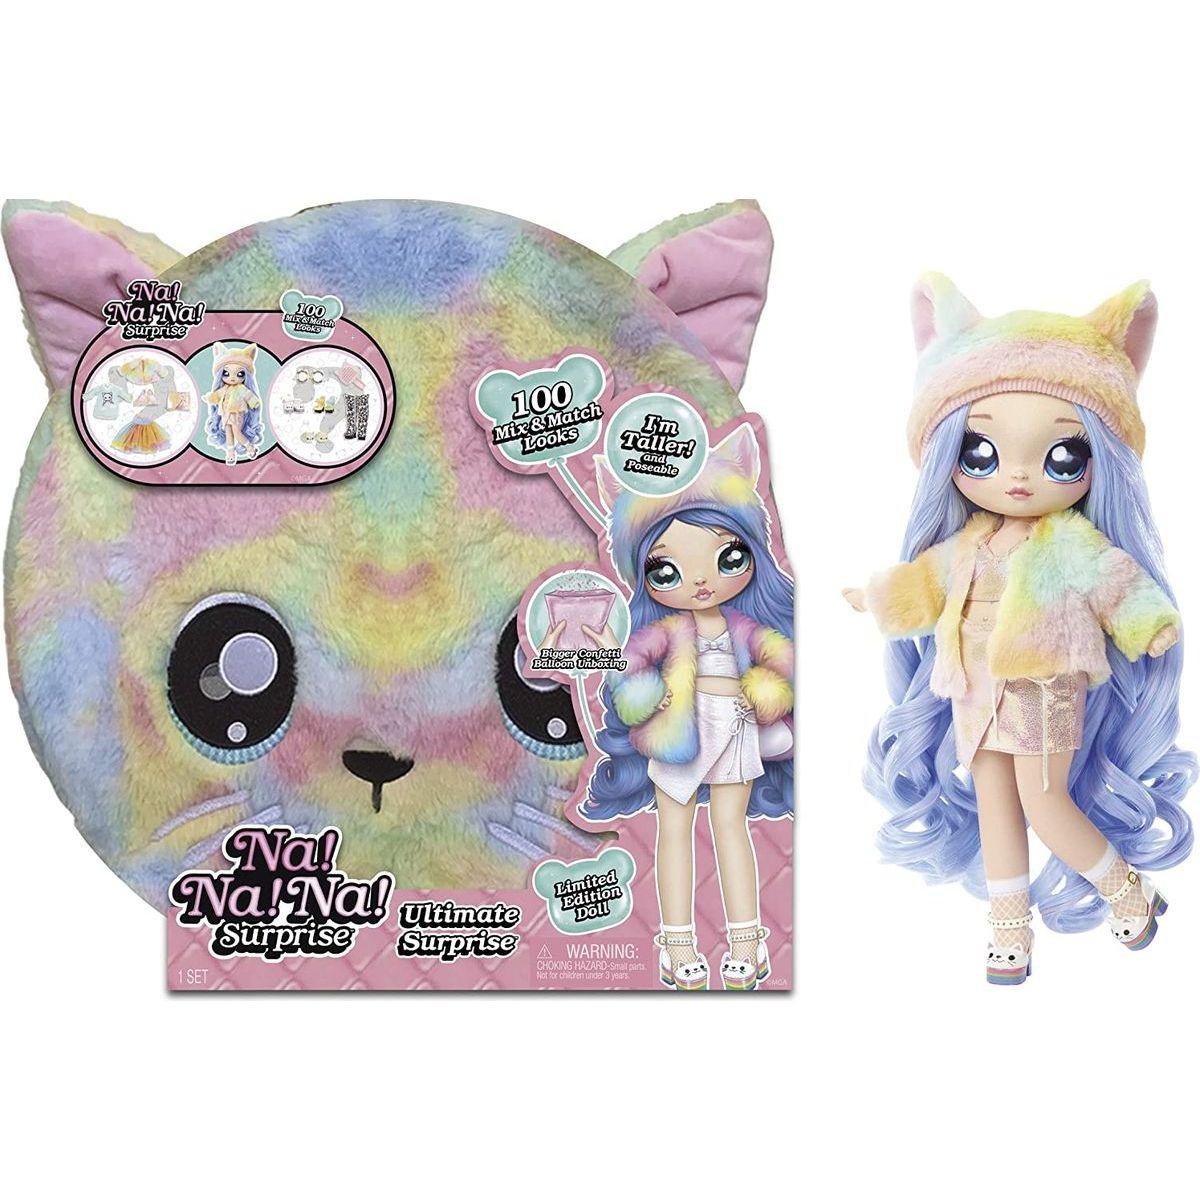 Na! Na! Na! Ultimate Surprise Set s prekvapením as bábikou Rainbow Kitty